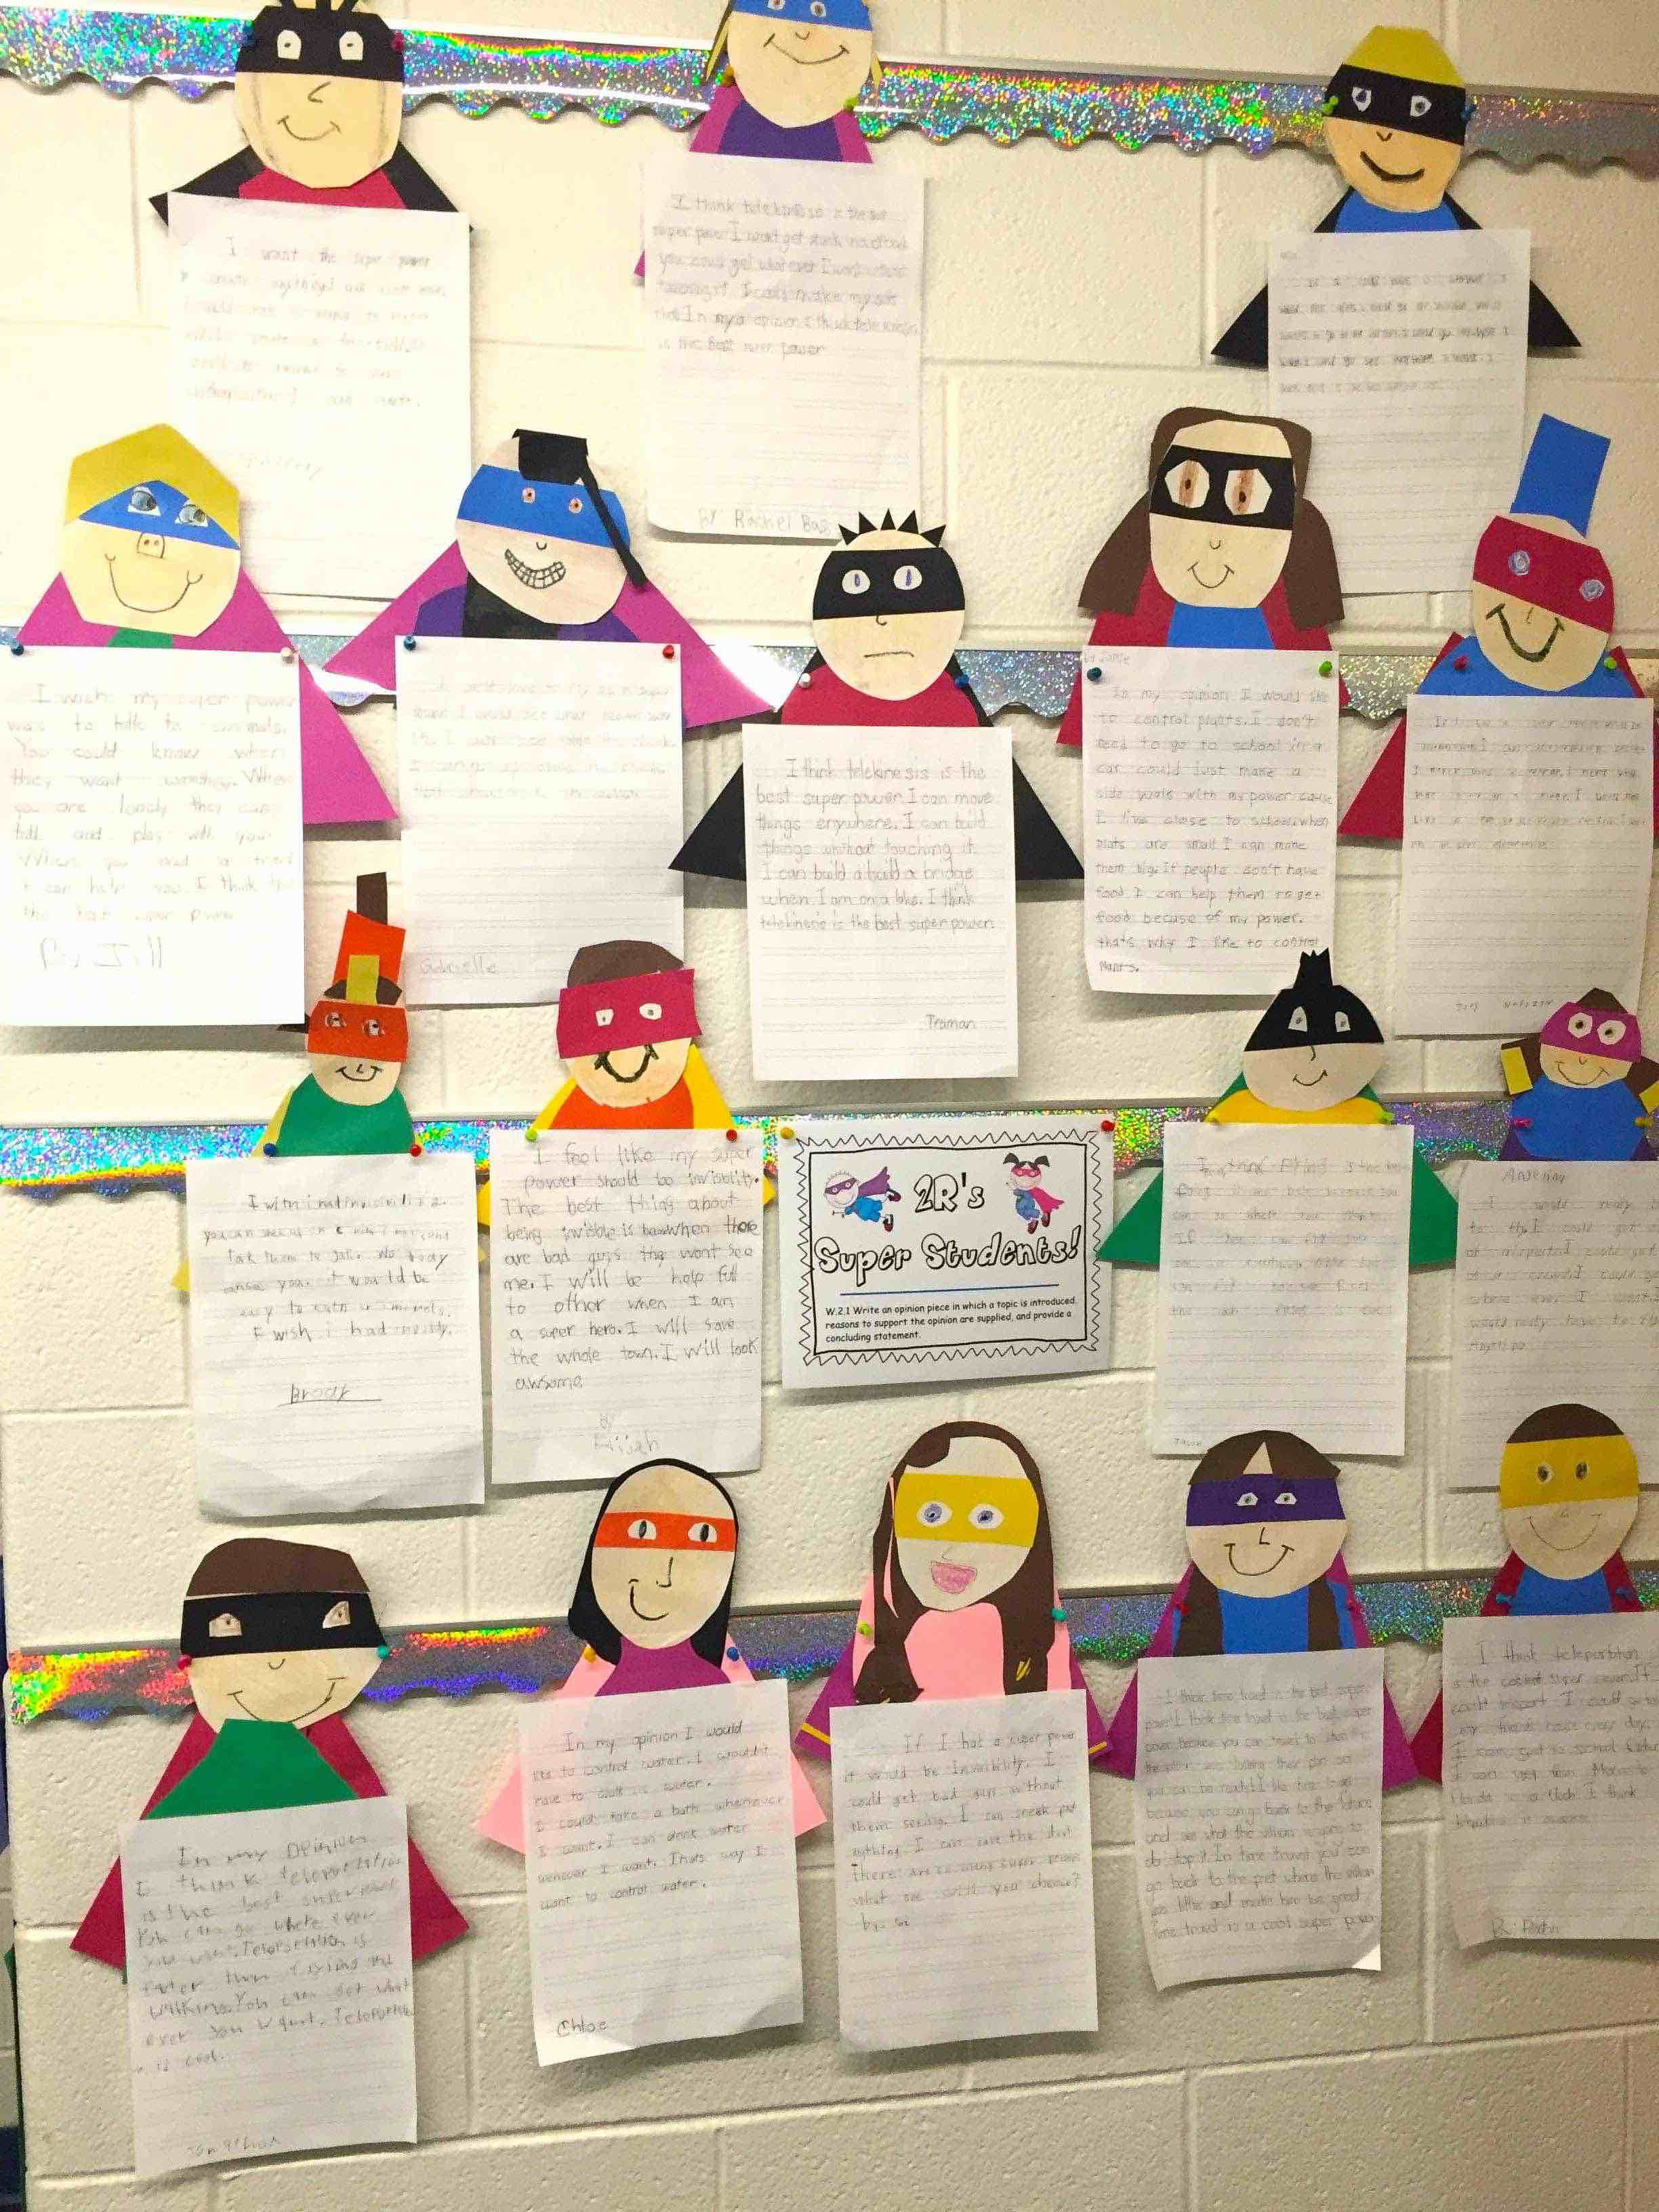 Superheroes Make For Amazing Class Activities